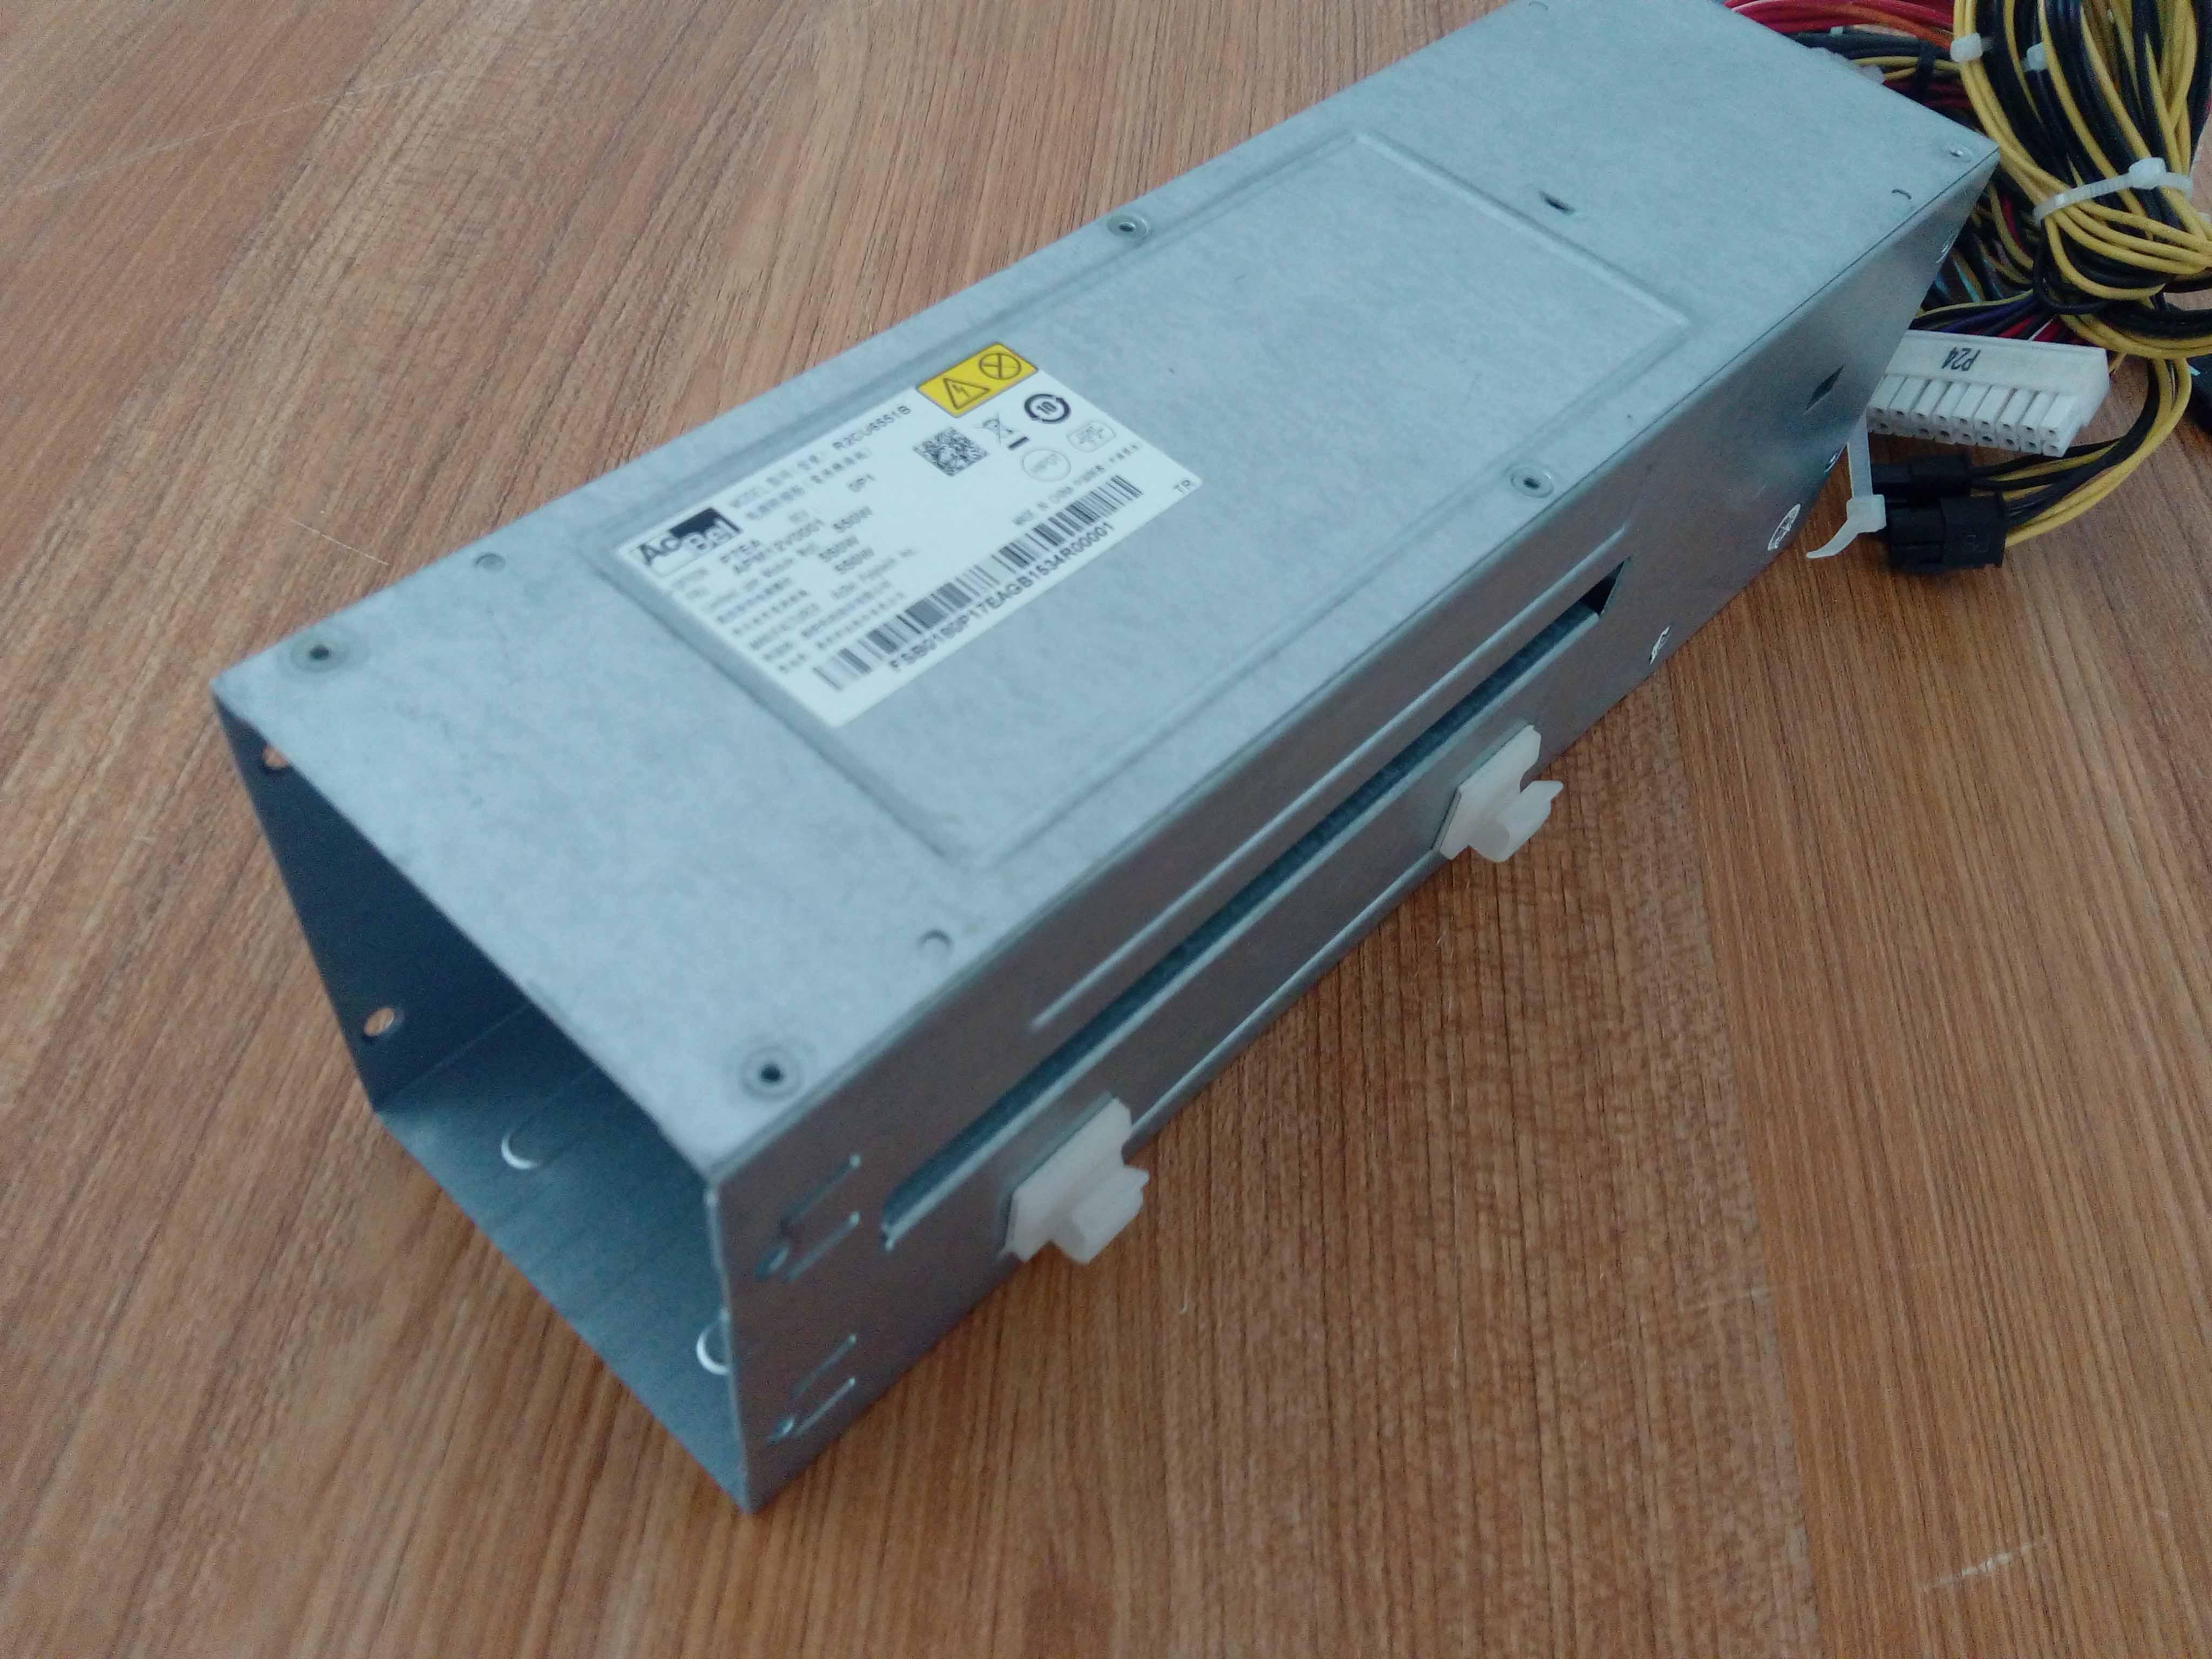 康舒 R2CU5551A 康舒R2CU5551A 2U 1+1 550W冗余电源